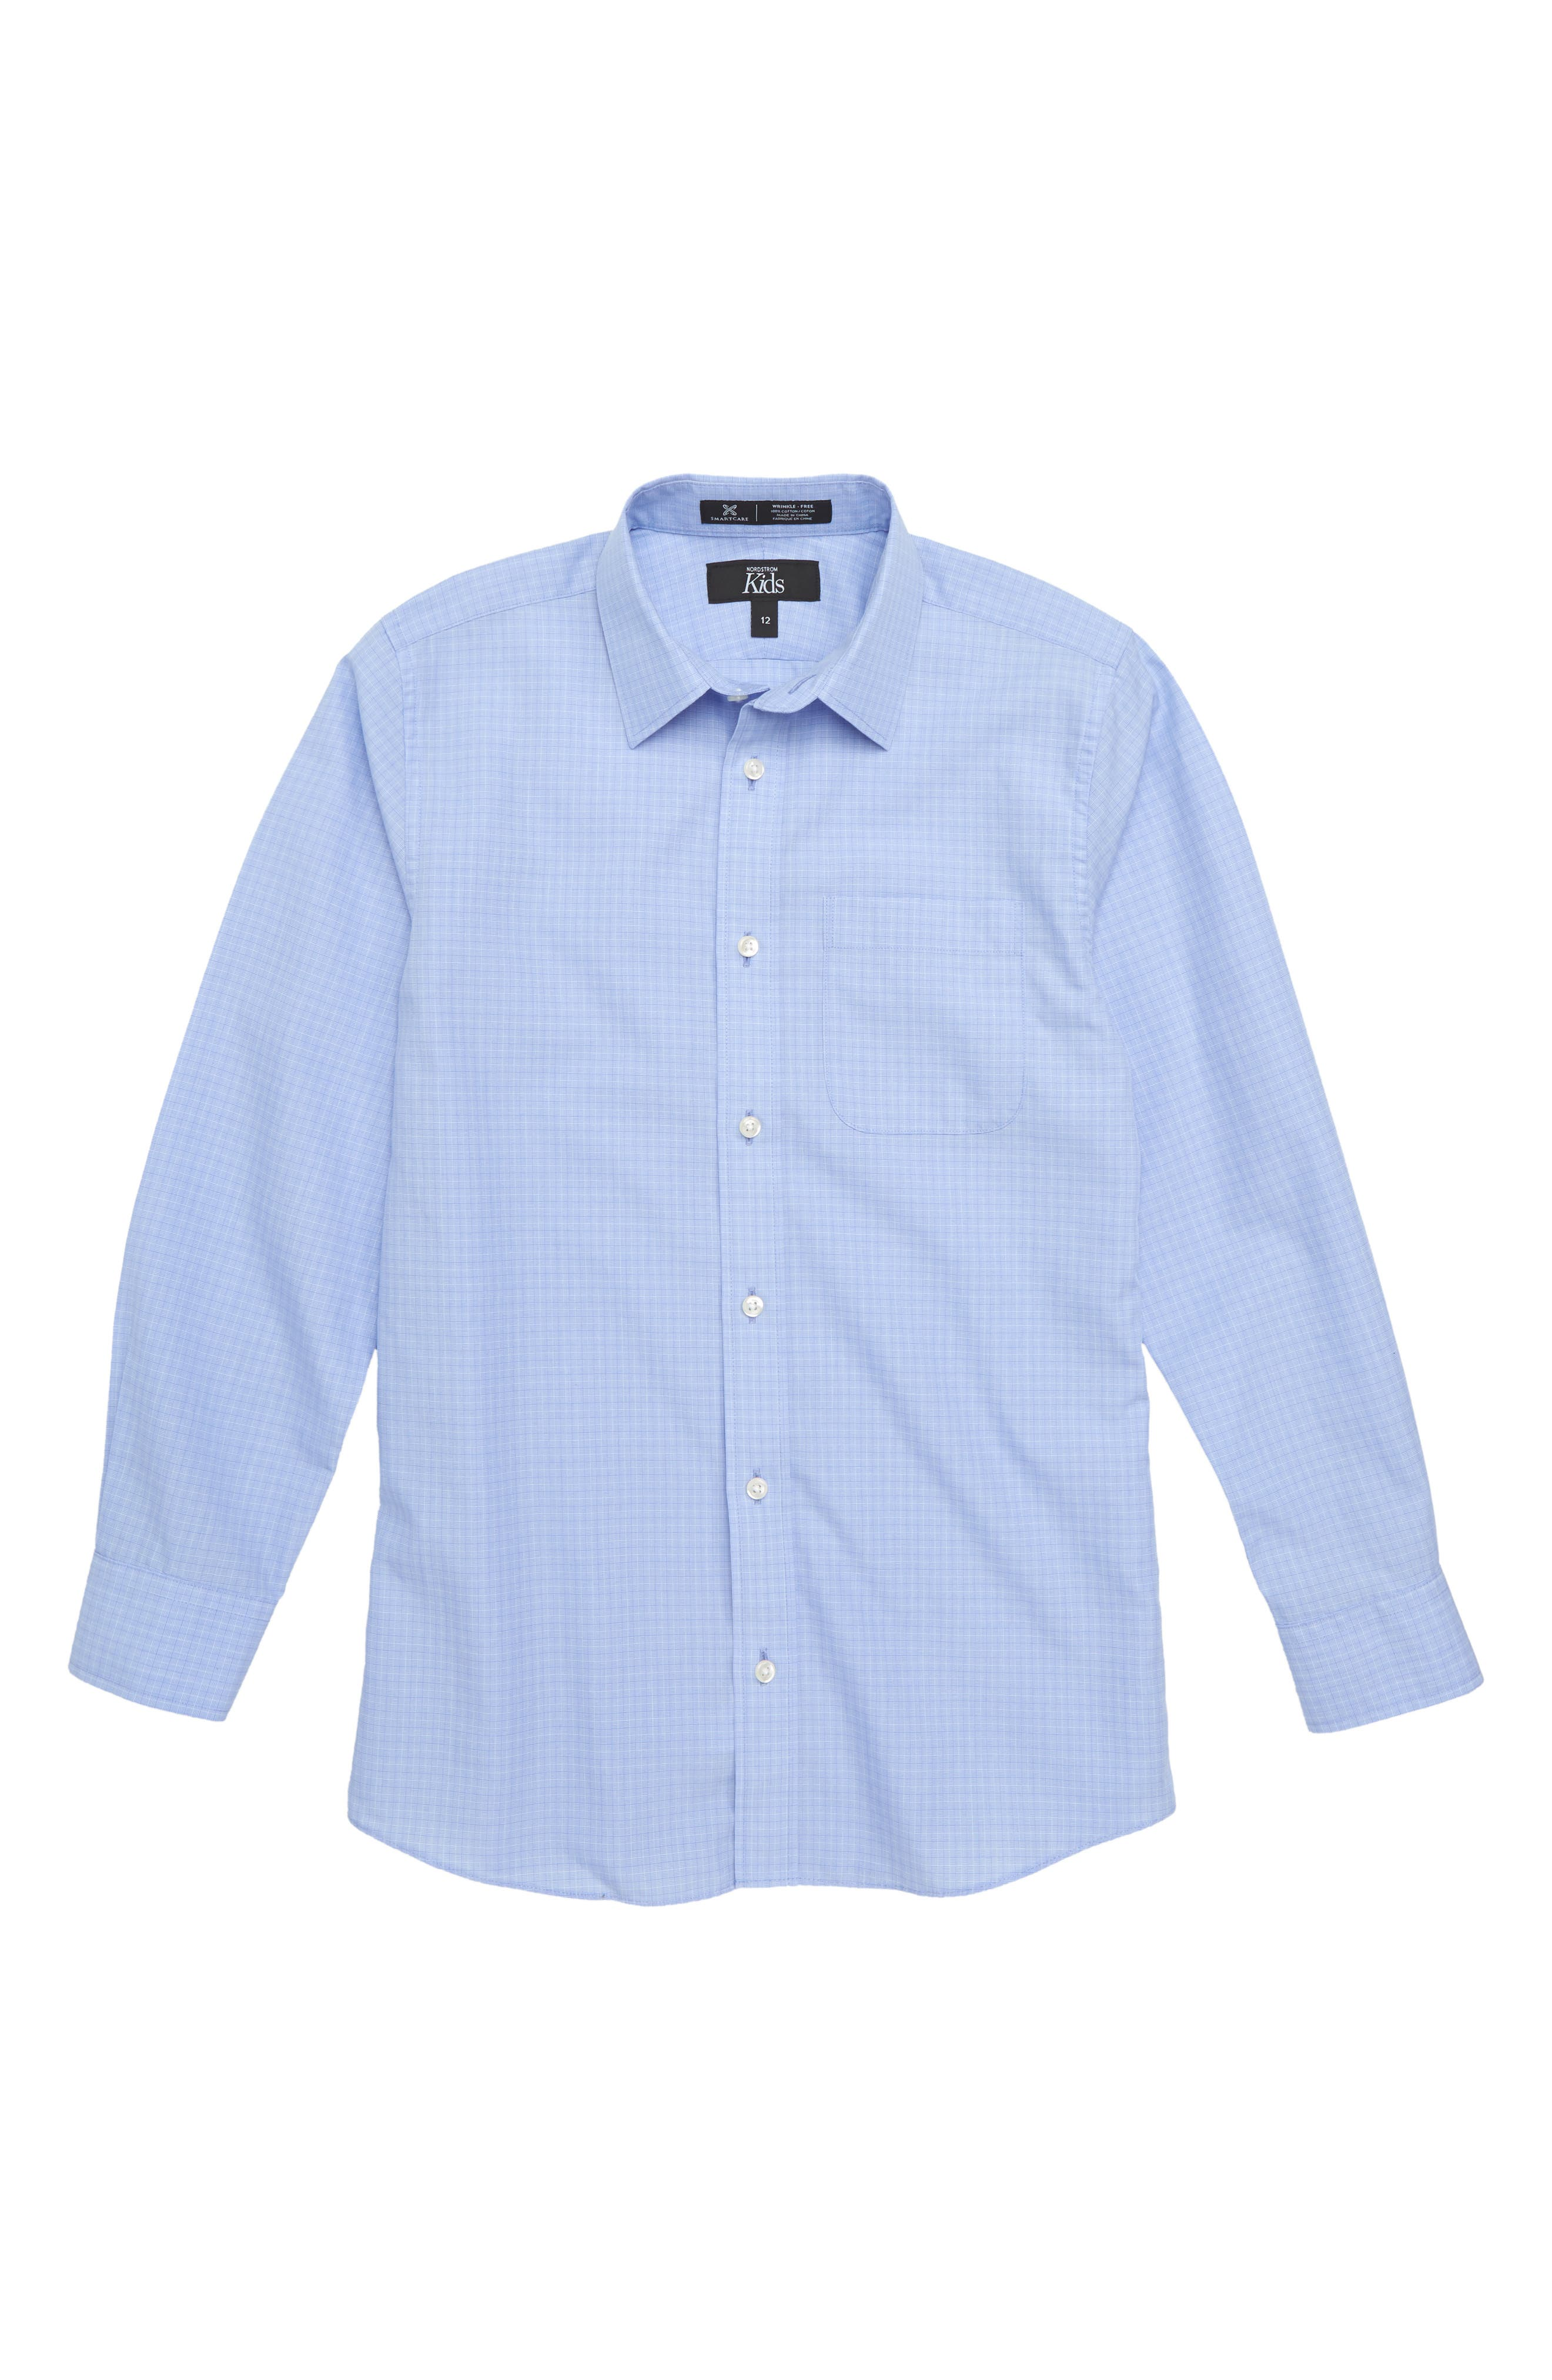 Dobby Checks Dress Shirt,                         Main,                         color, 450